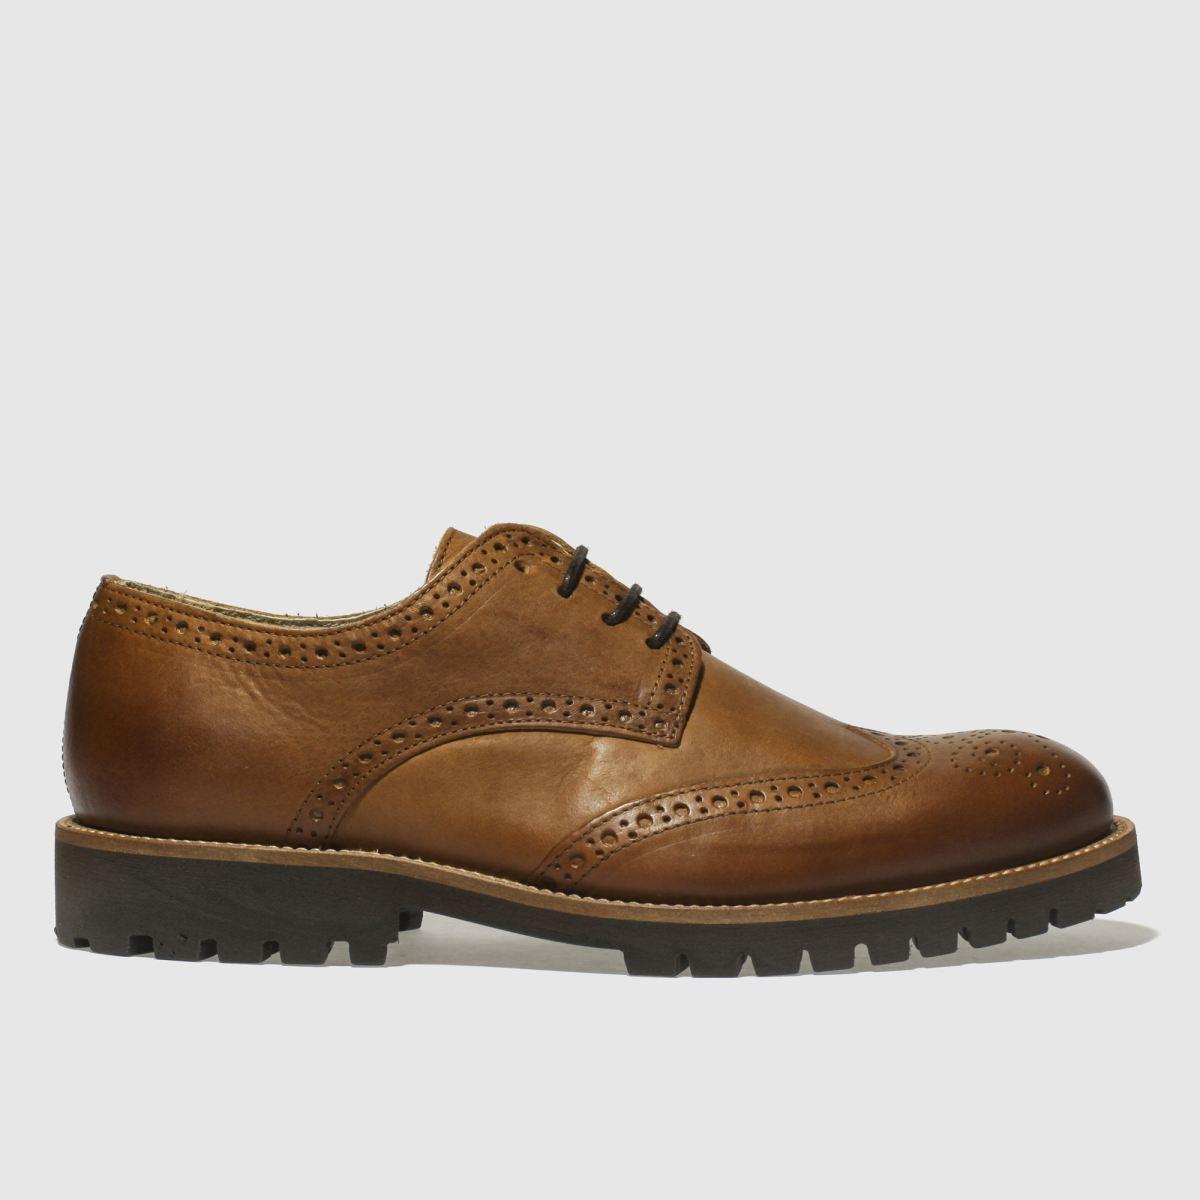 Schuh Tan Bishop Shoes